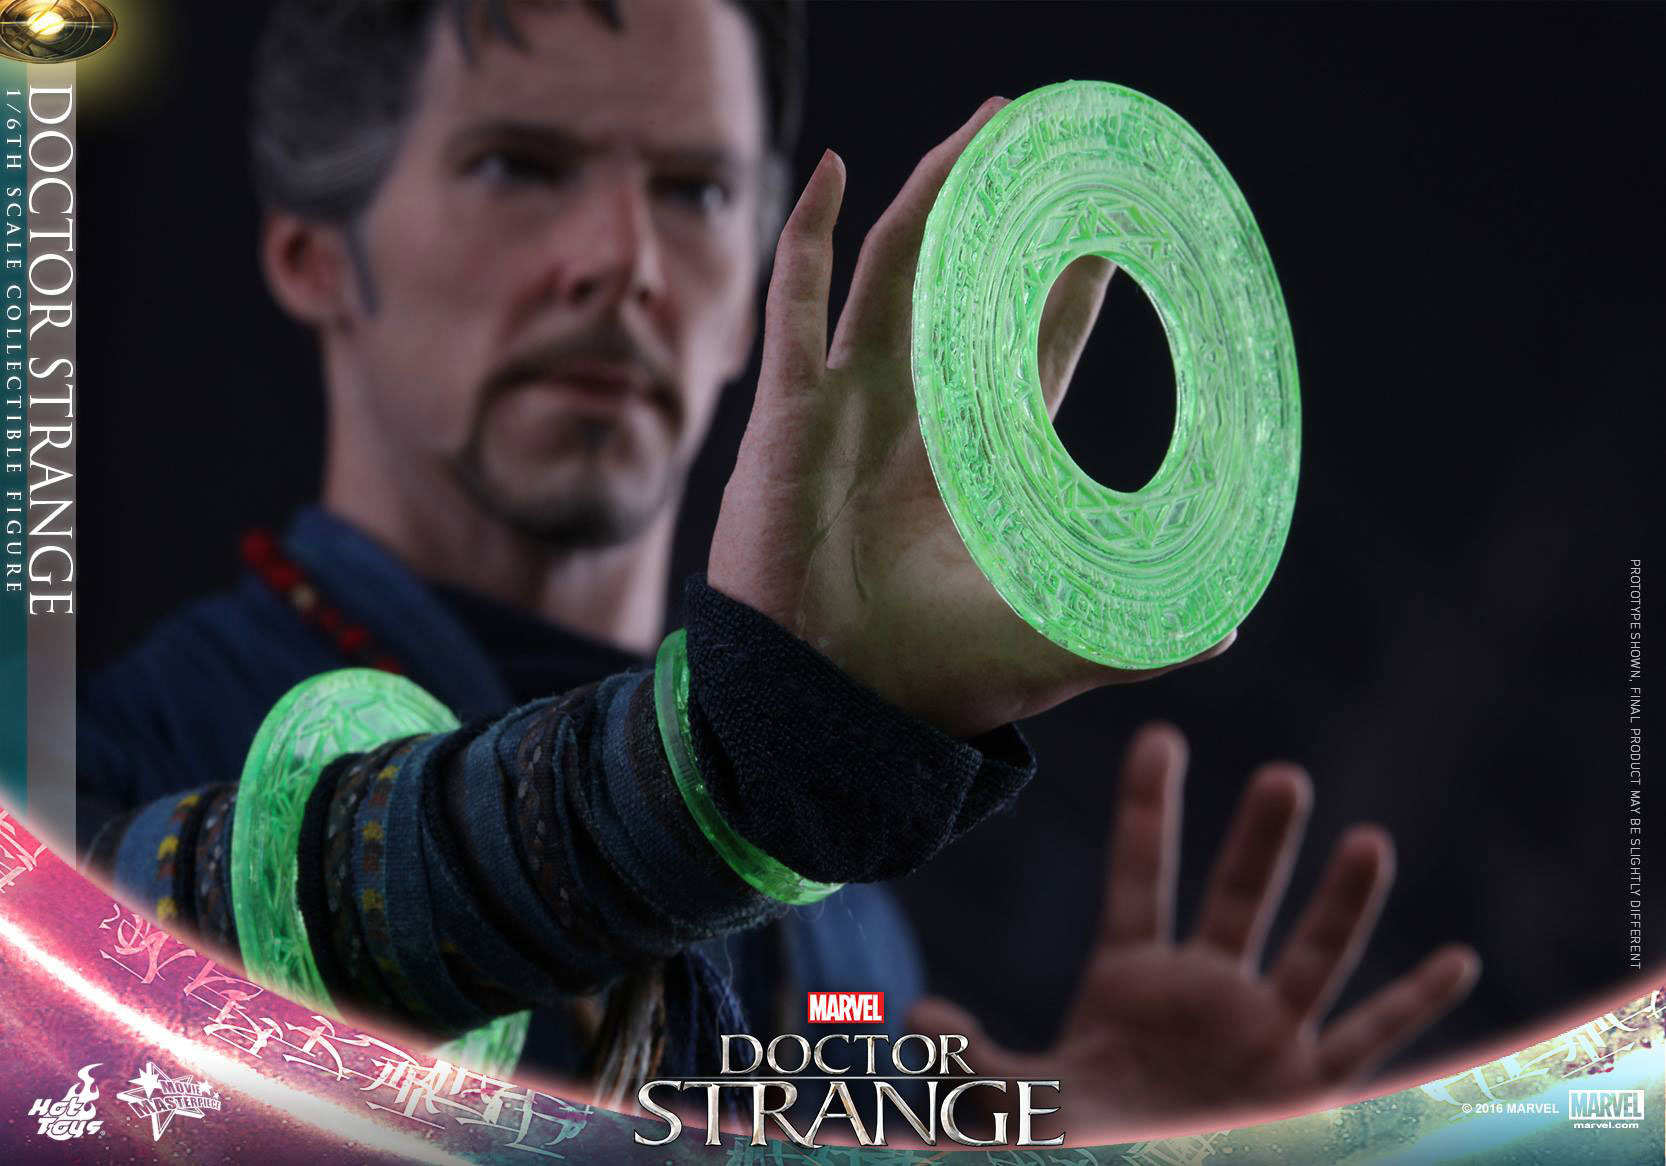 hot-toys-doctor-strange-movie-figure-mandalas-3